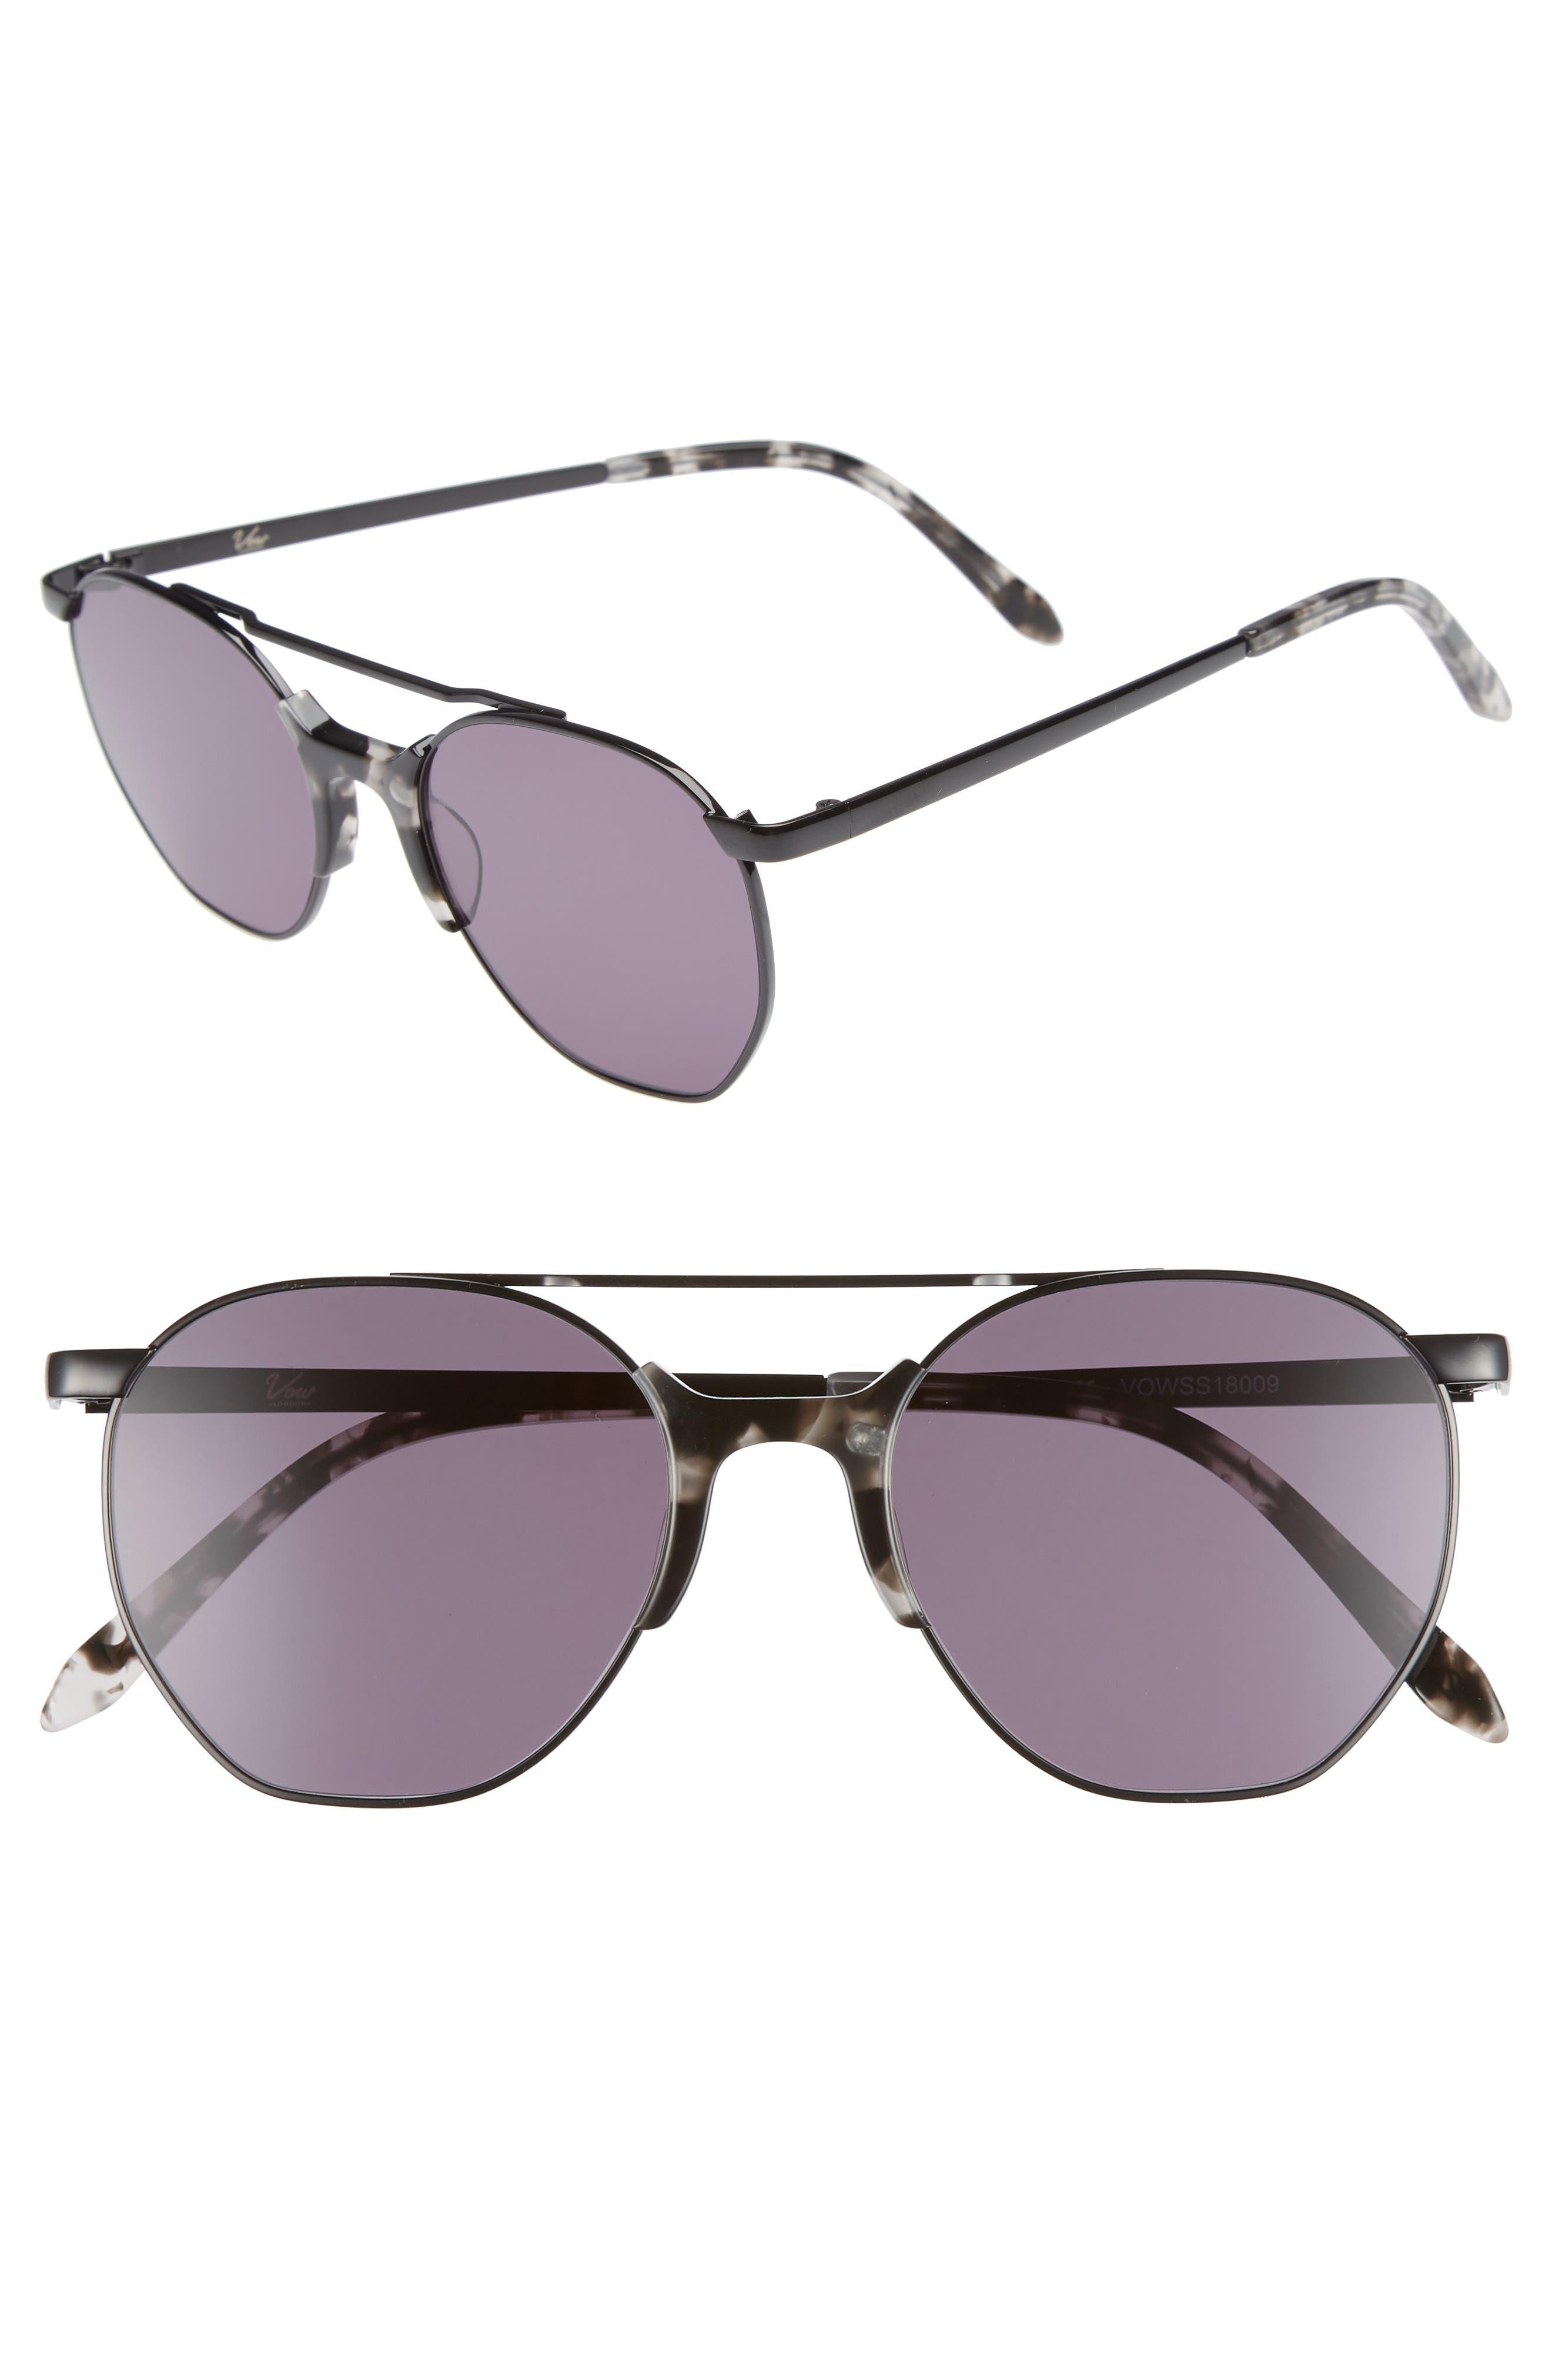 Raine 52mm Aviator Sunglasses,                         Main,                         color, SMOKE TORTOISE/ BLACK